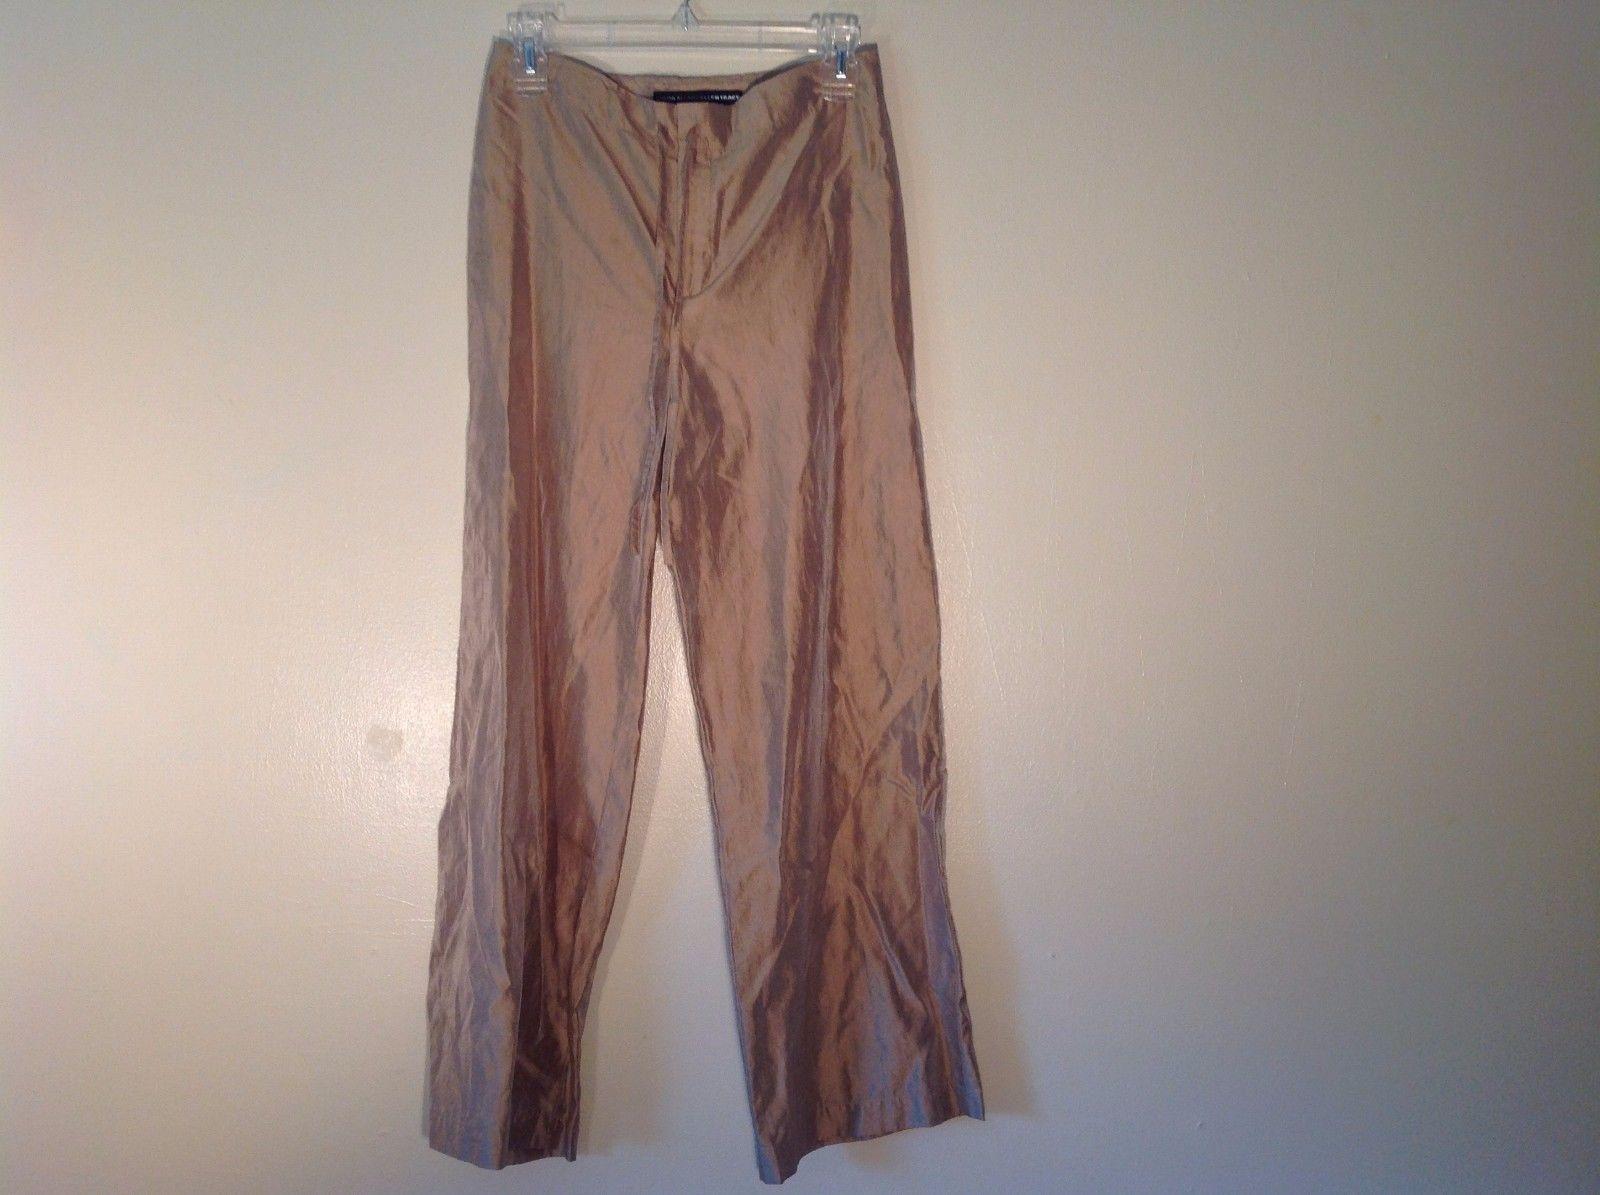 Good Condition Linda Allard Ellen Tracy Petite 0 Gold Pants Drawstring Semisheer